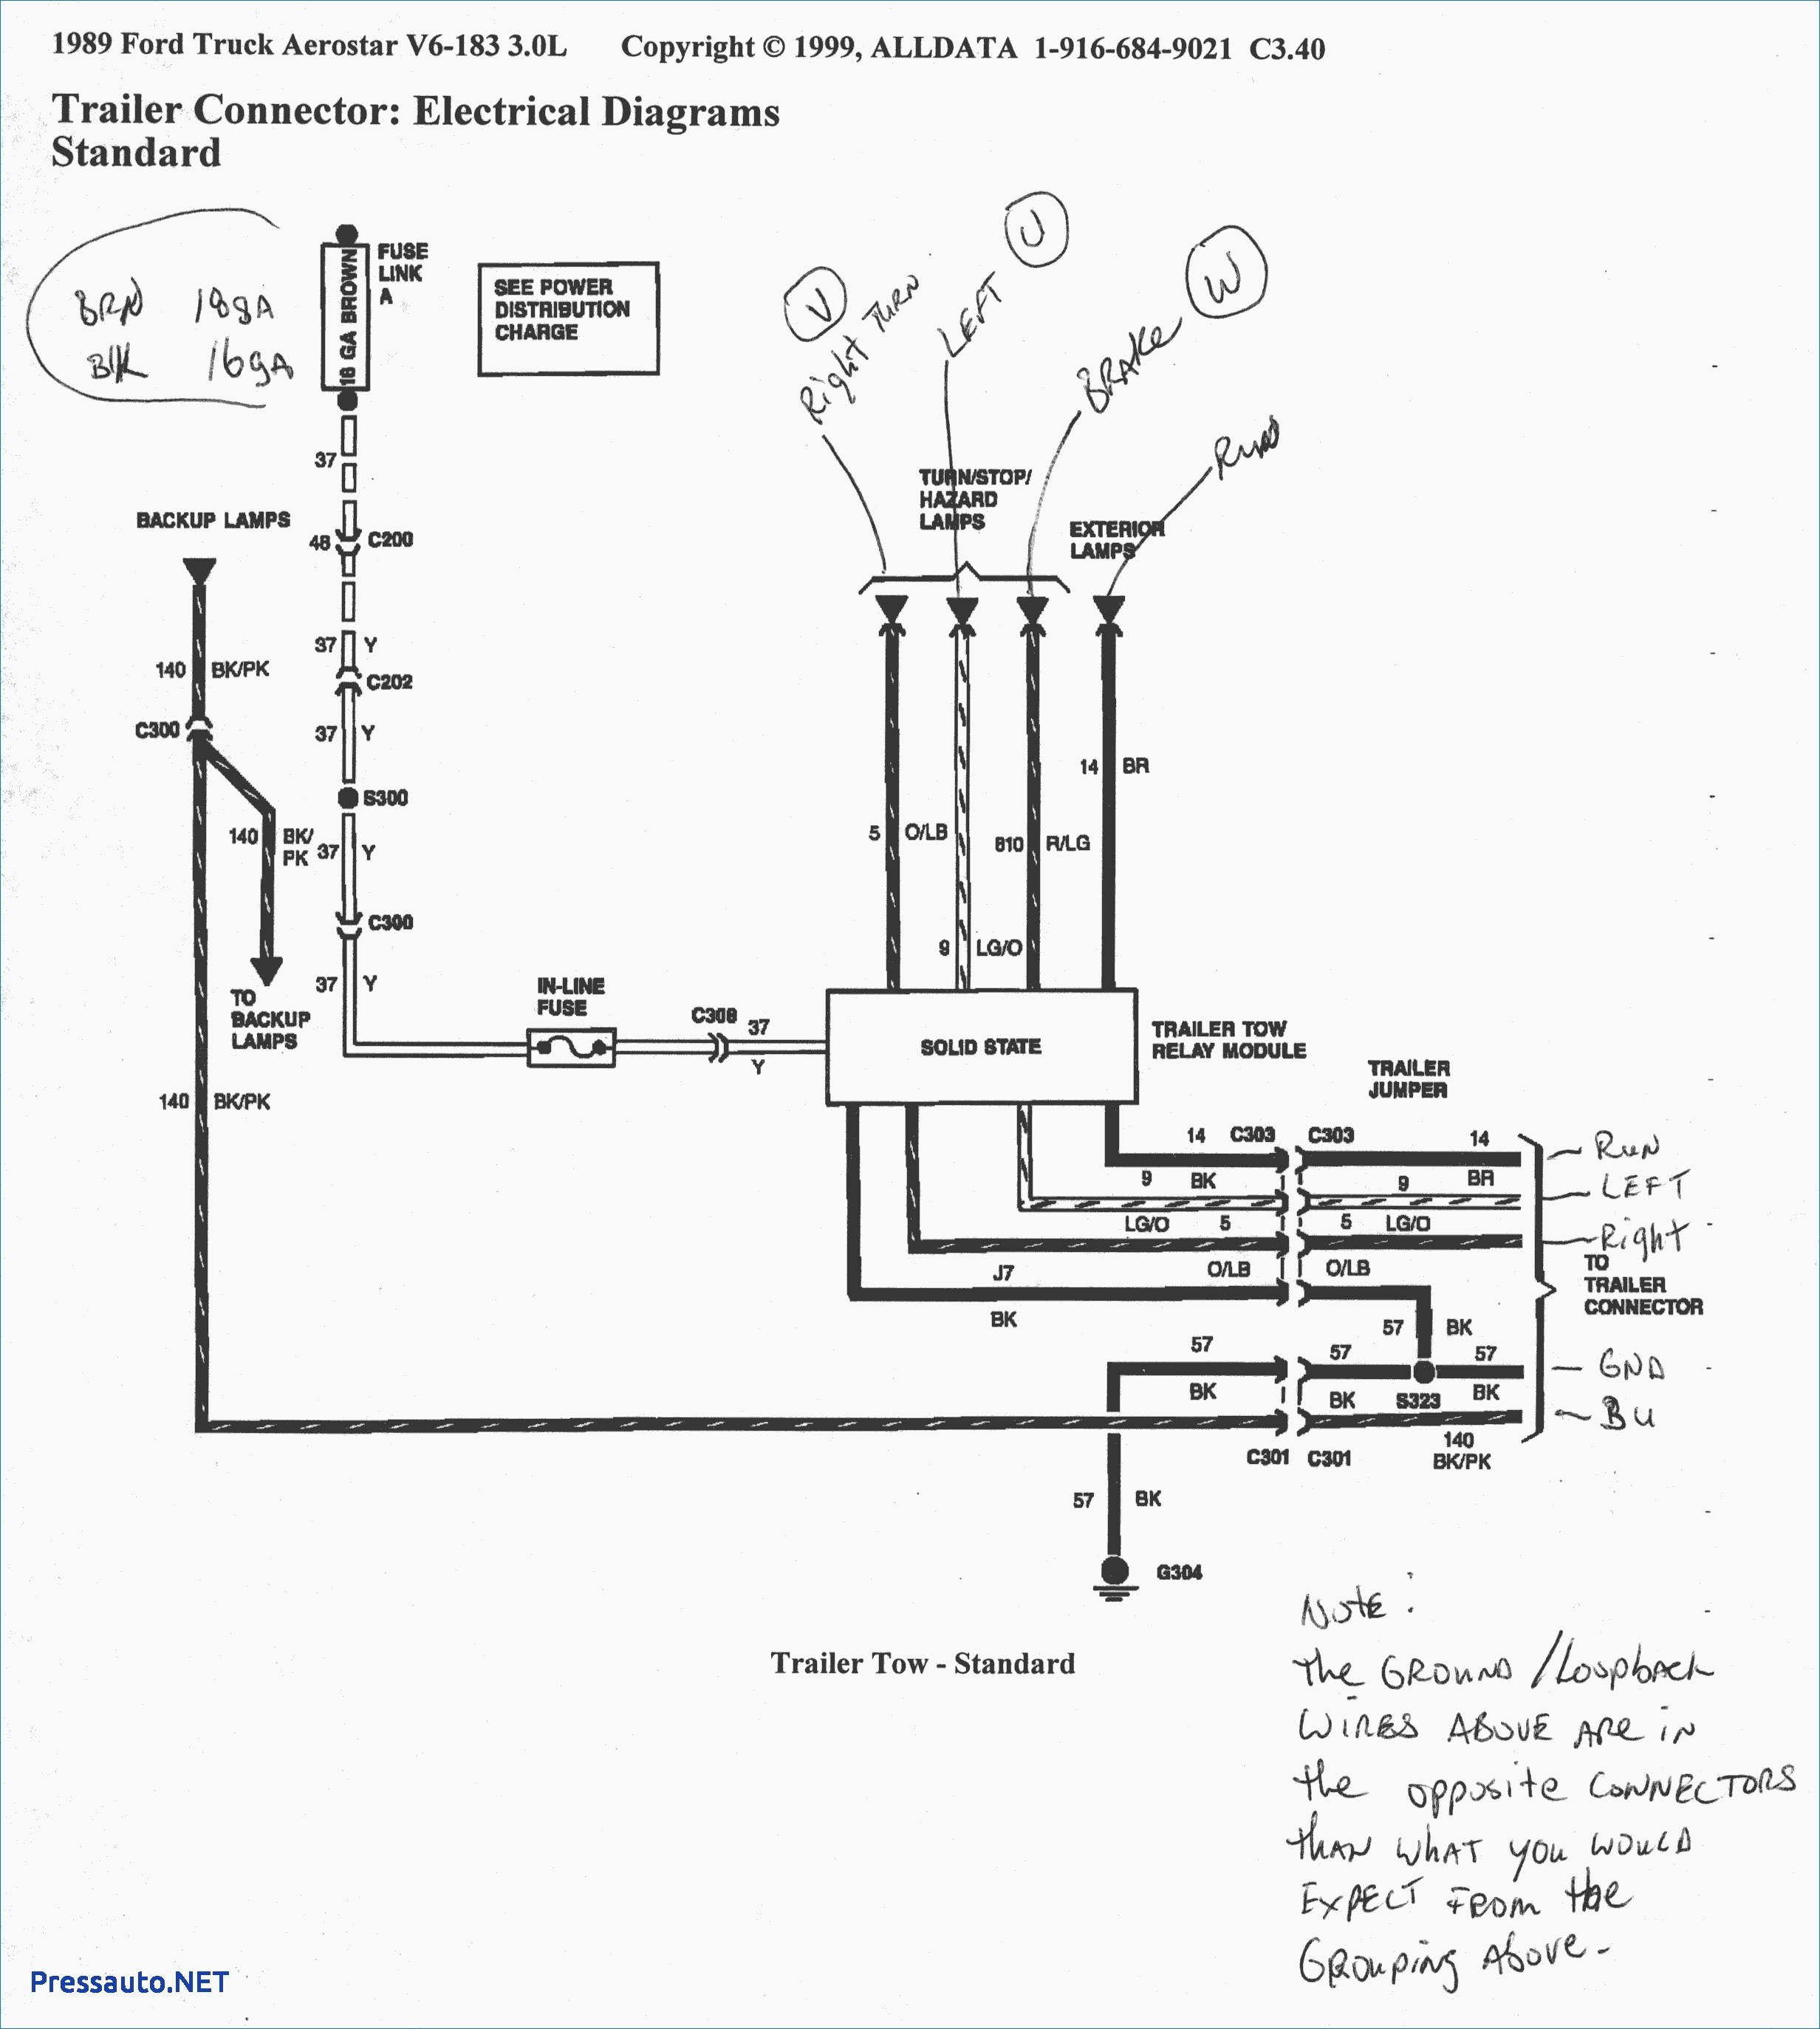 1998 F150 Trailer Wiring Diagram - wiring diagram circuit-time - circuit -time.vaiatempo.itVai a Tempo!